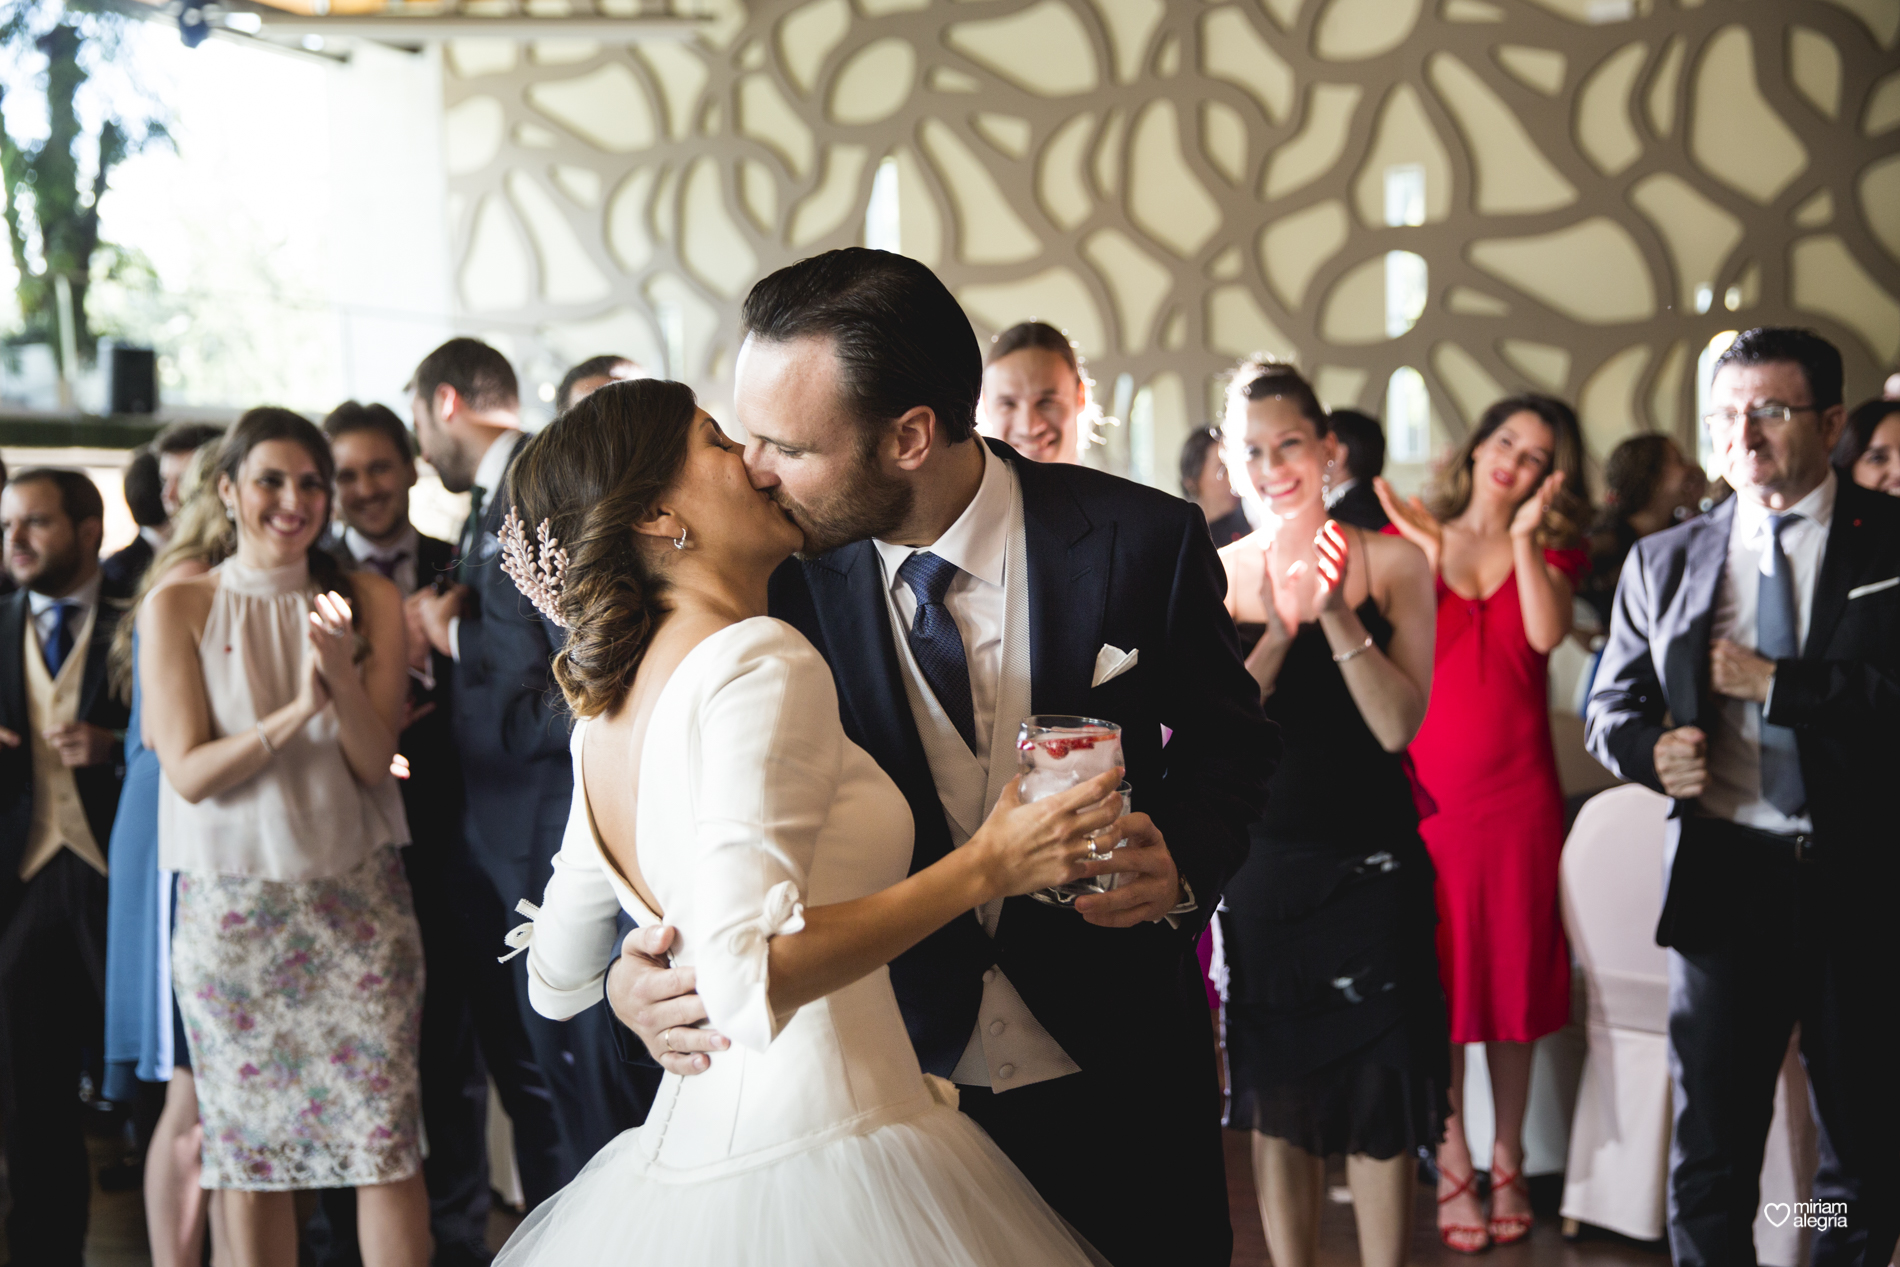 boda-en-la-catedral-de-murcia-miriam-alegria-fotografos-boda-murcia-77